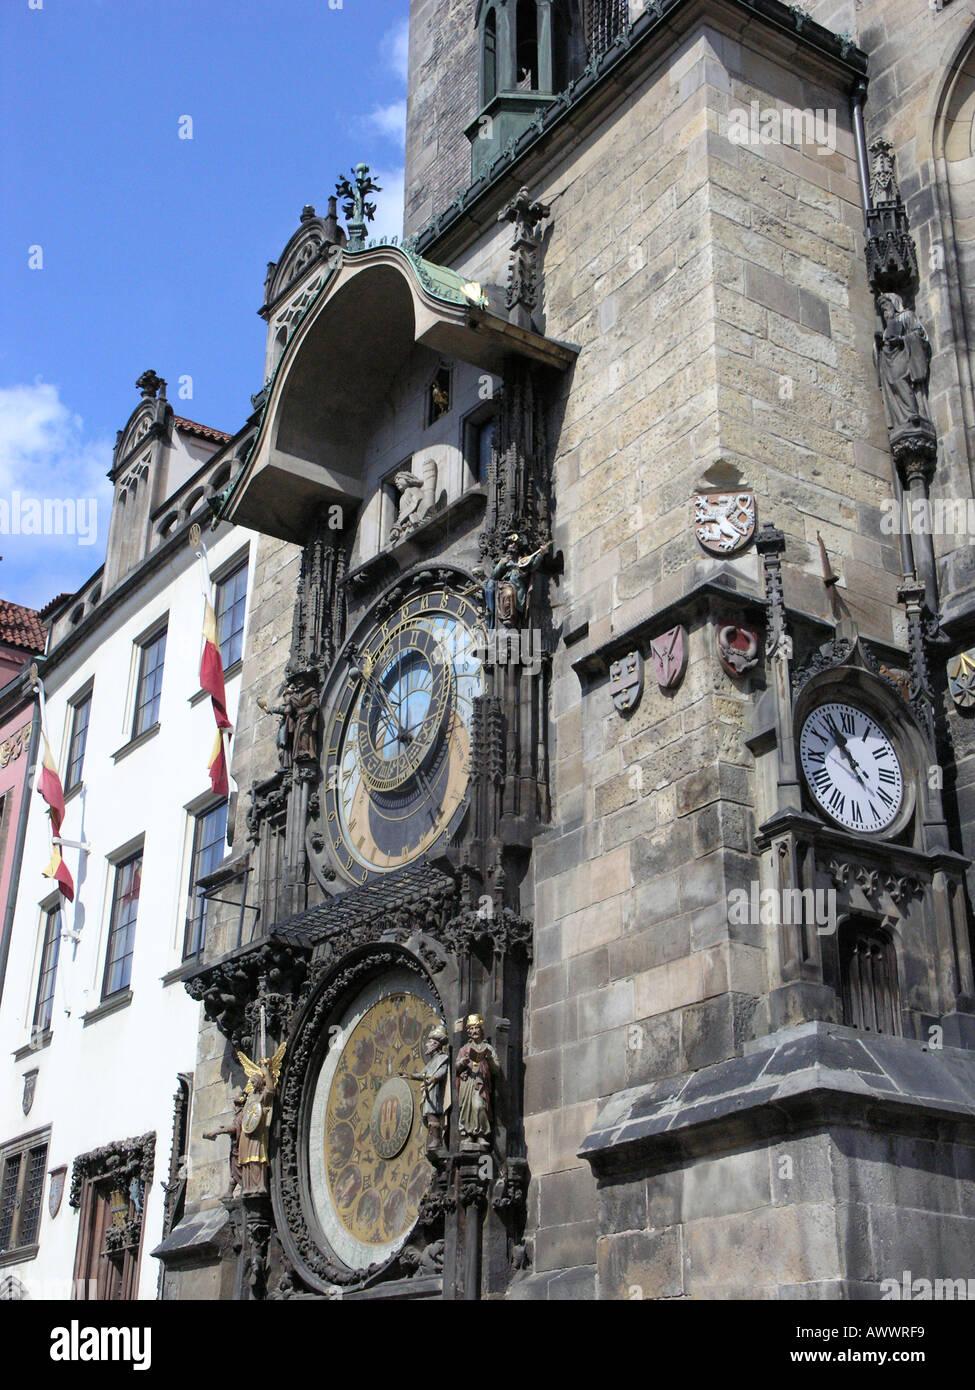 Astronomical Clock Old Town Square Prague Czech Republic - Stock Image